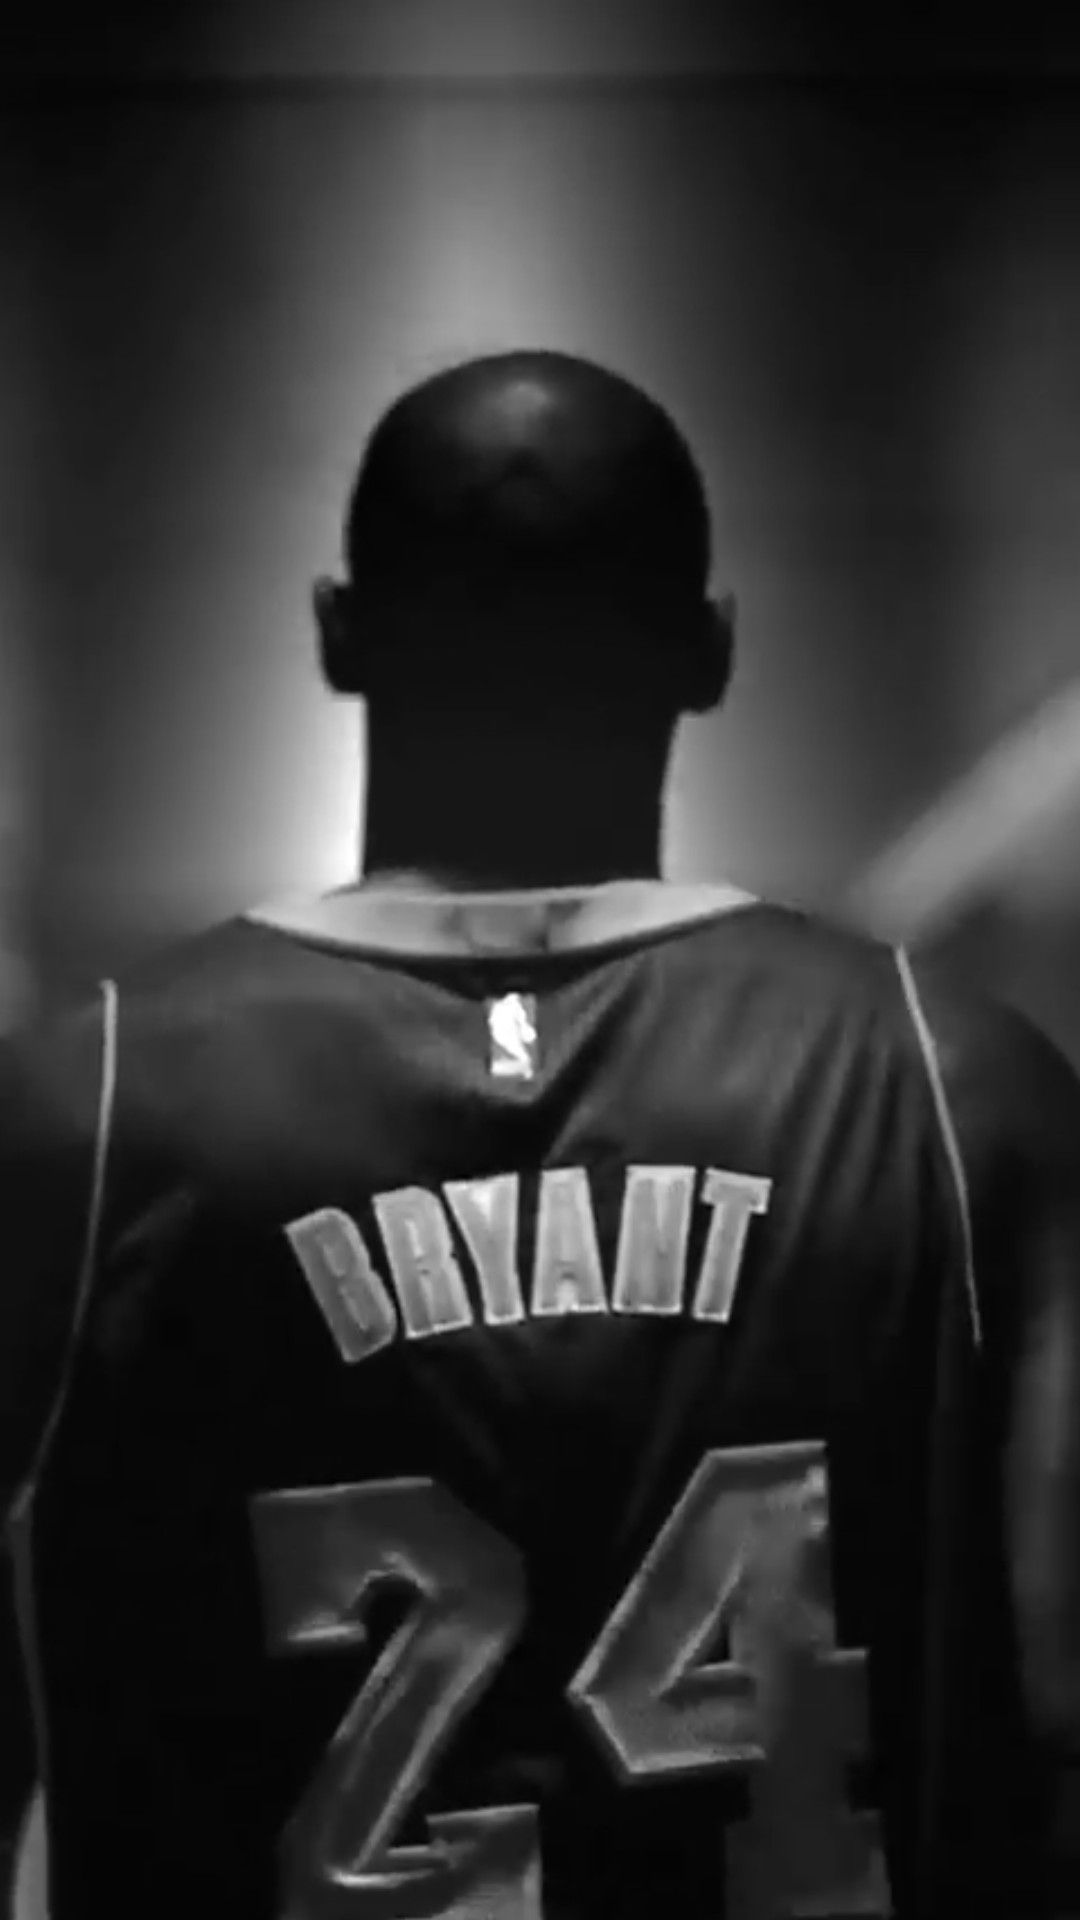 Kobe Bryant Wallpaper Black And White : bryant, wallpaper, black, white, خيار, قيلولة, كرس, Bryant, Black, White, Jersey, Dsvdedommel.com